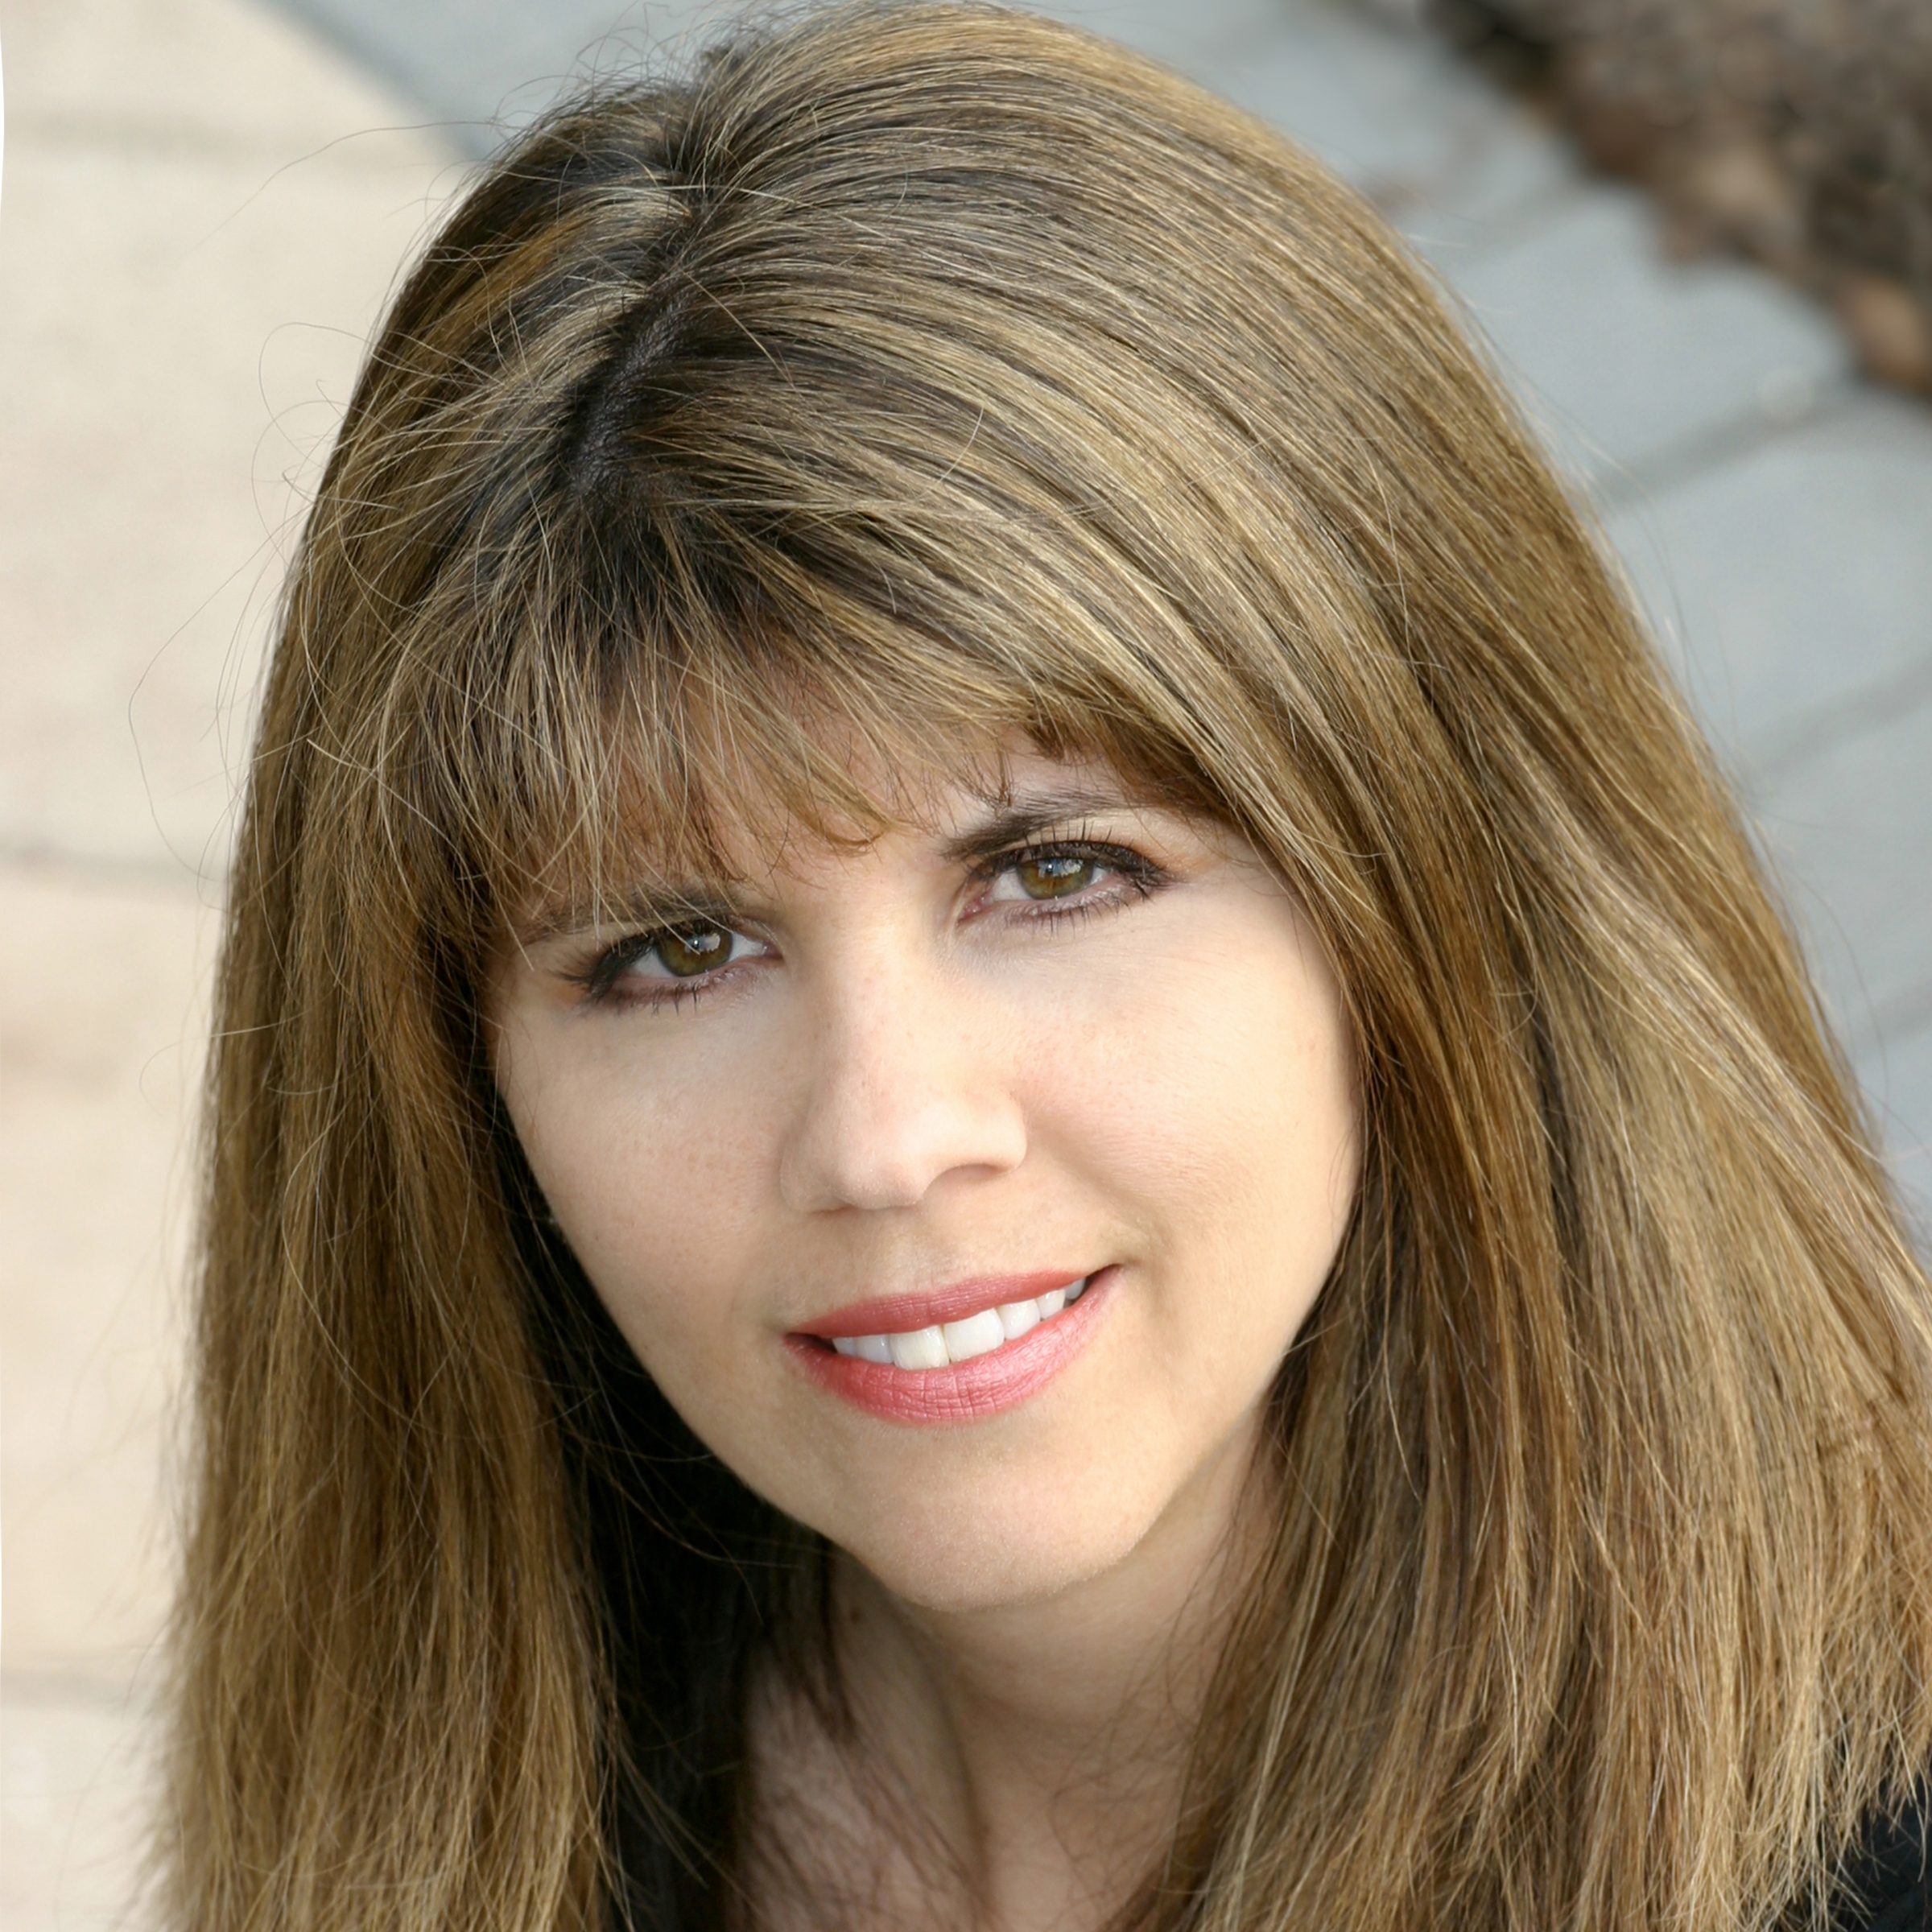 Suzanne Crowley